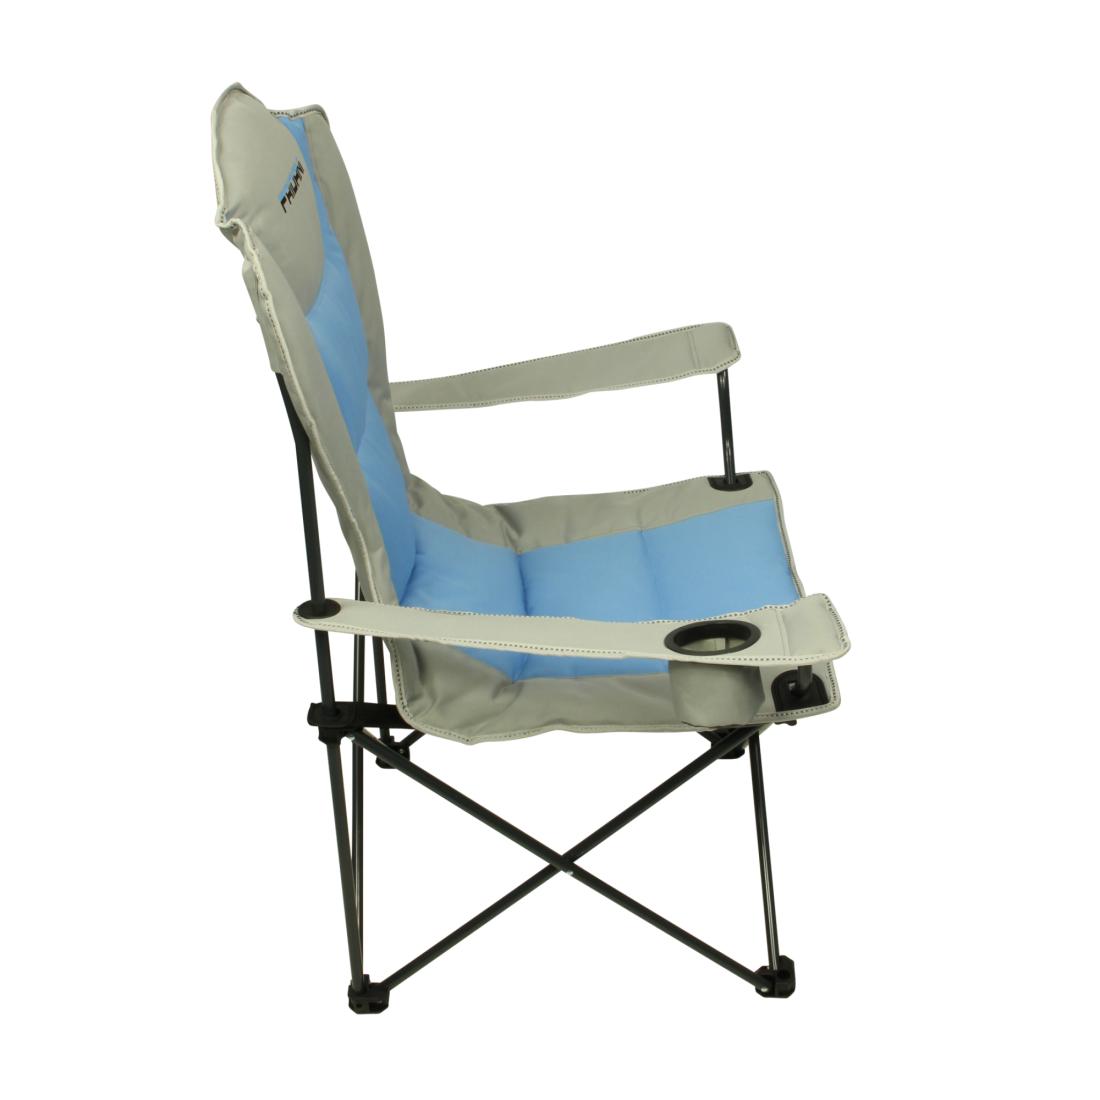 fridani fsb 108 si ge de camping xxl pliant enti rement rembourr porte gobelet 3900g. Black Bedroom Furniture Sets. Home Design Ideas